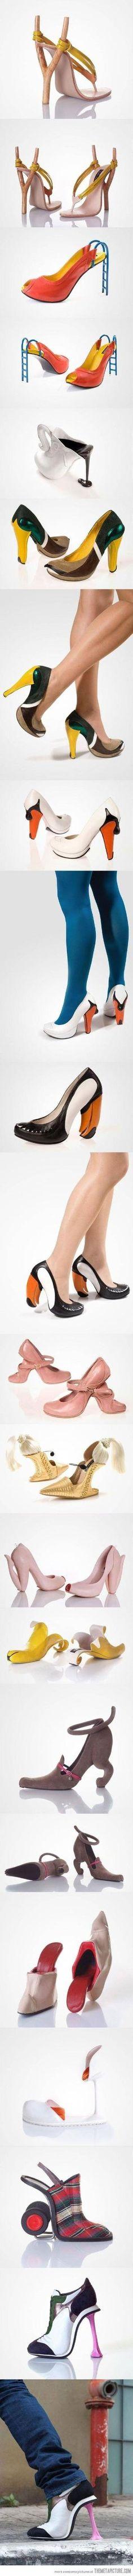 INSANE!!! Creative high heel designs by sjulian1